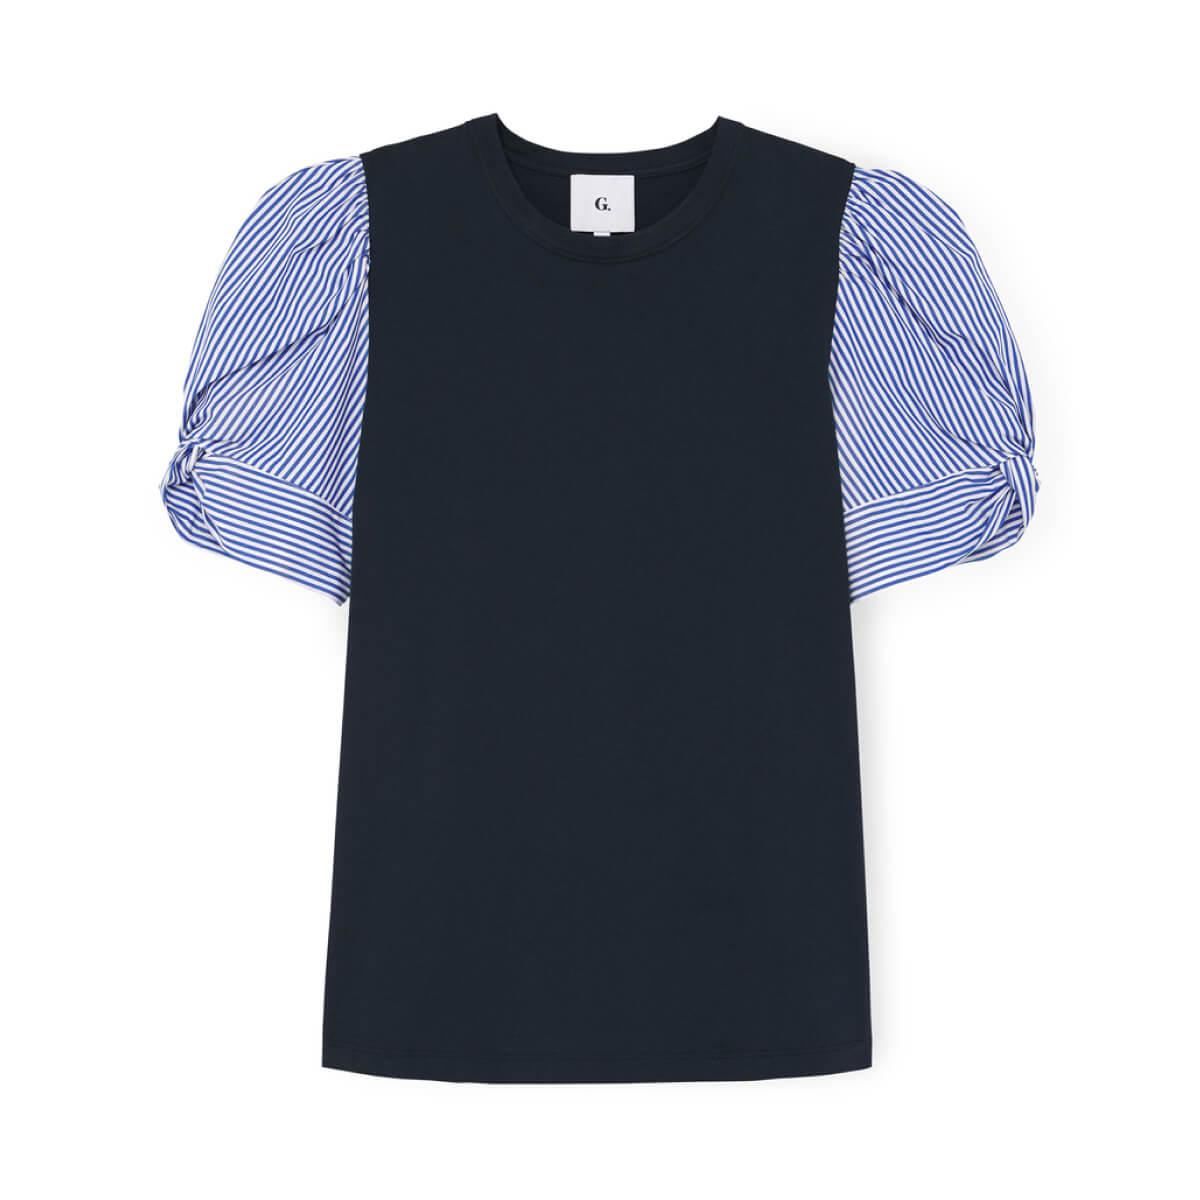 G.Label Justine Puff-Sleeve T-Shirt